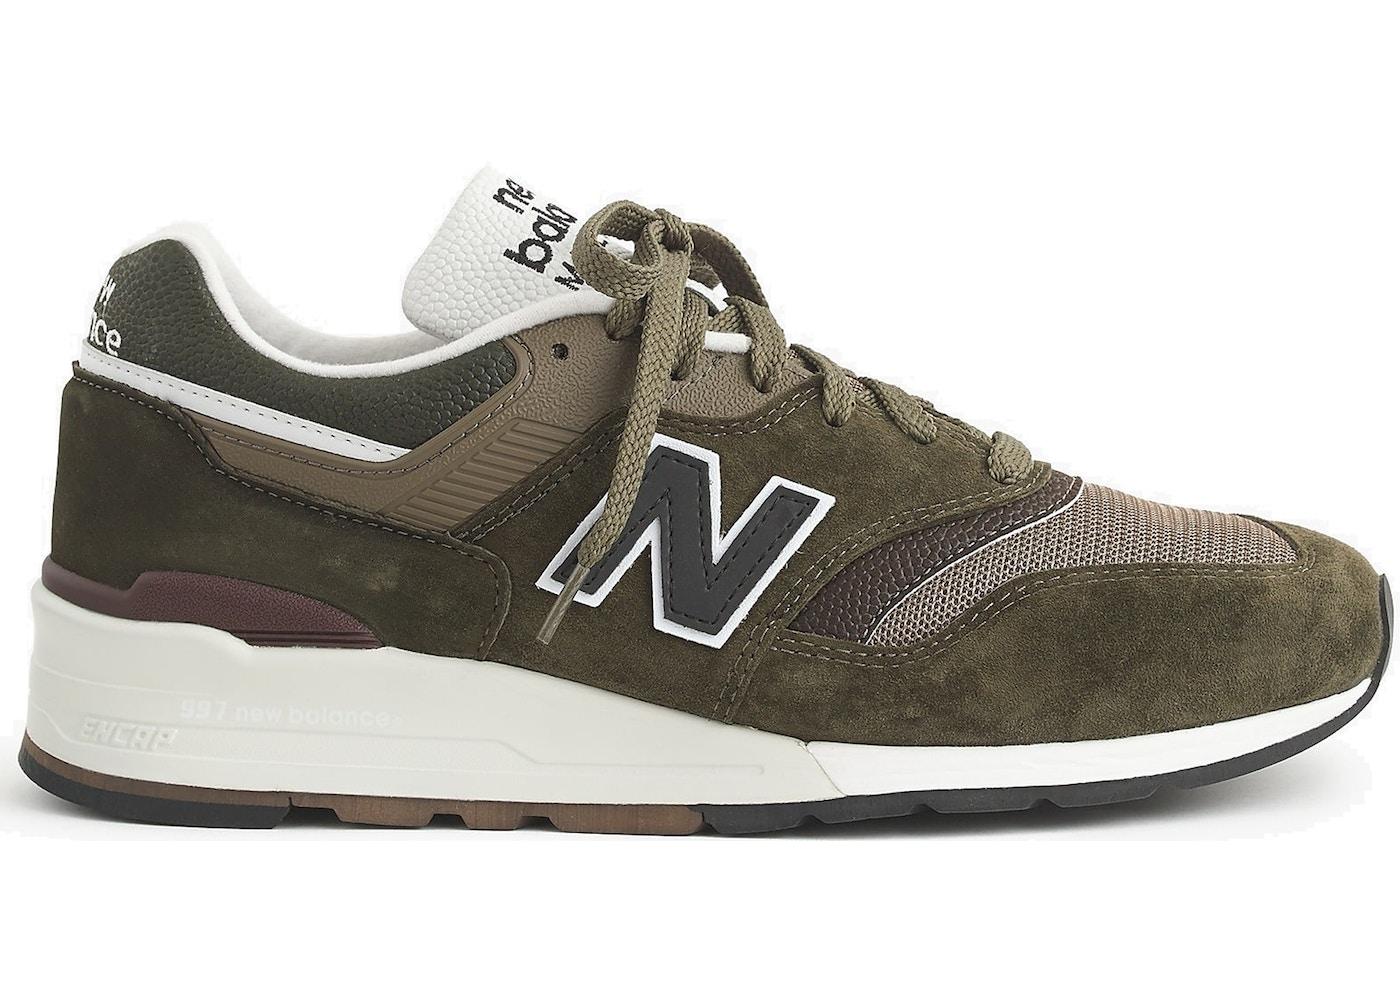 Details about New Balance NB 574 Camo Green Tan White #ML574CMC Men